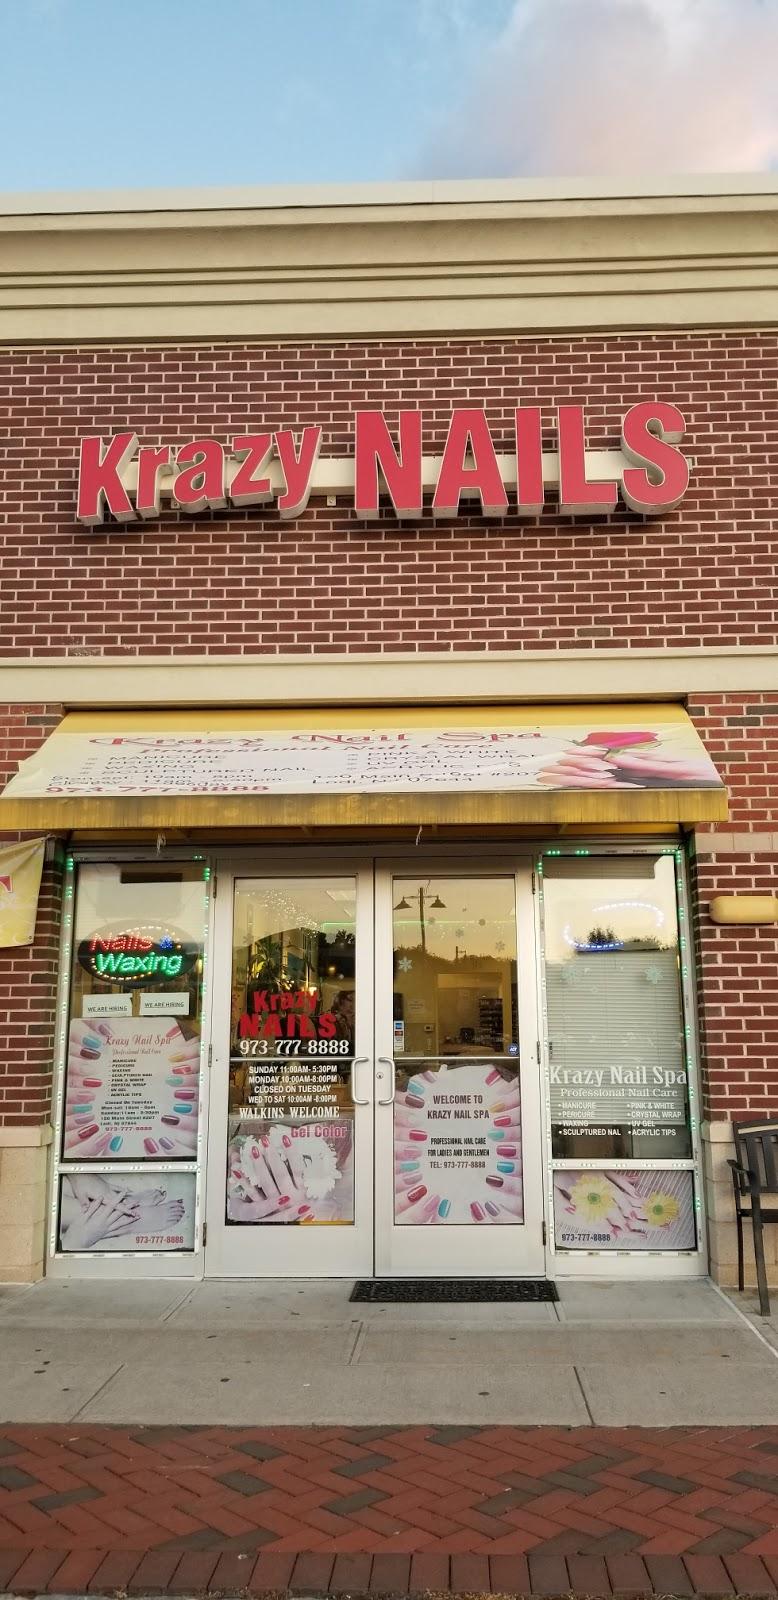 Nail Salon 07644  - Krazy Nails - Nail Salon in Lodi NJ 07644